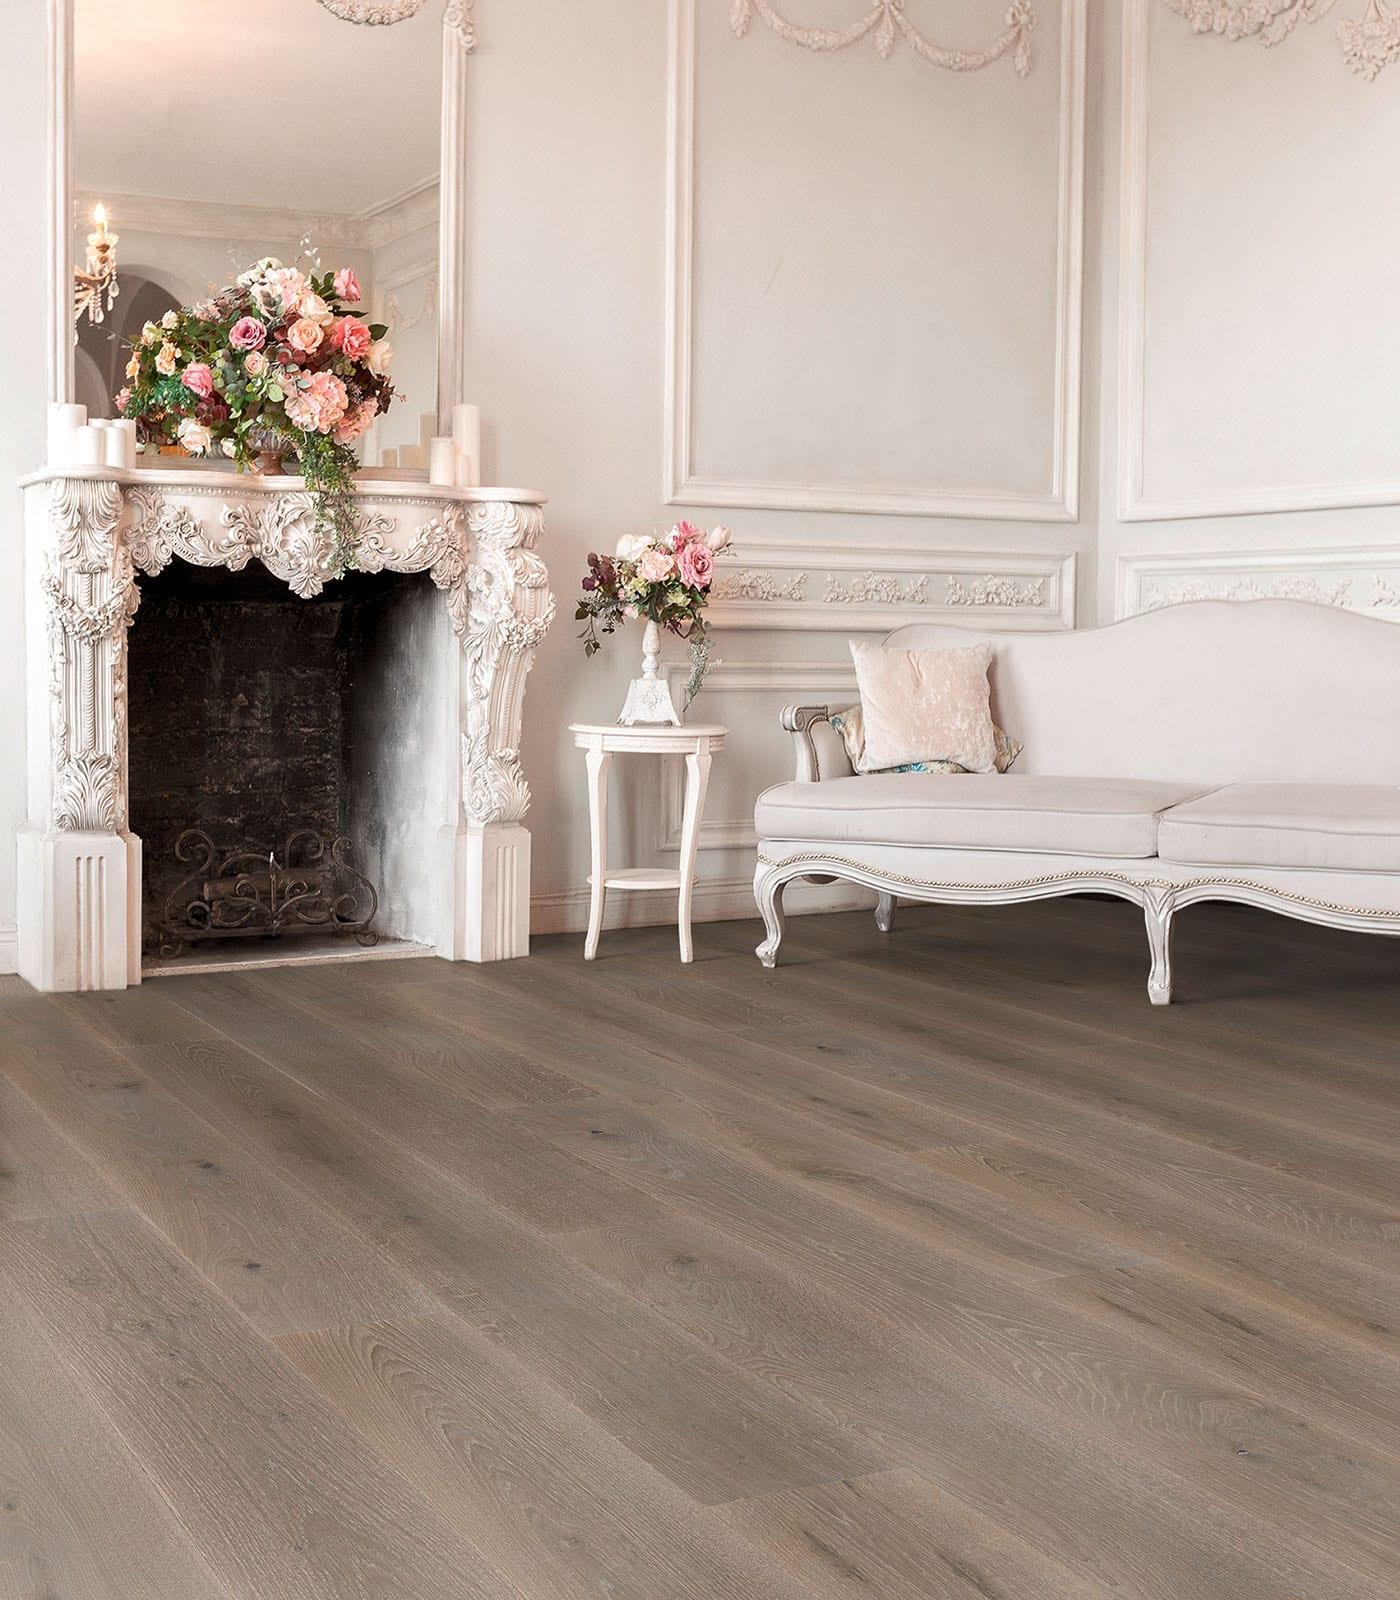 Venice-Lifestyle Collection-European Oak Floors-room